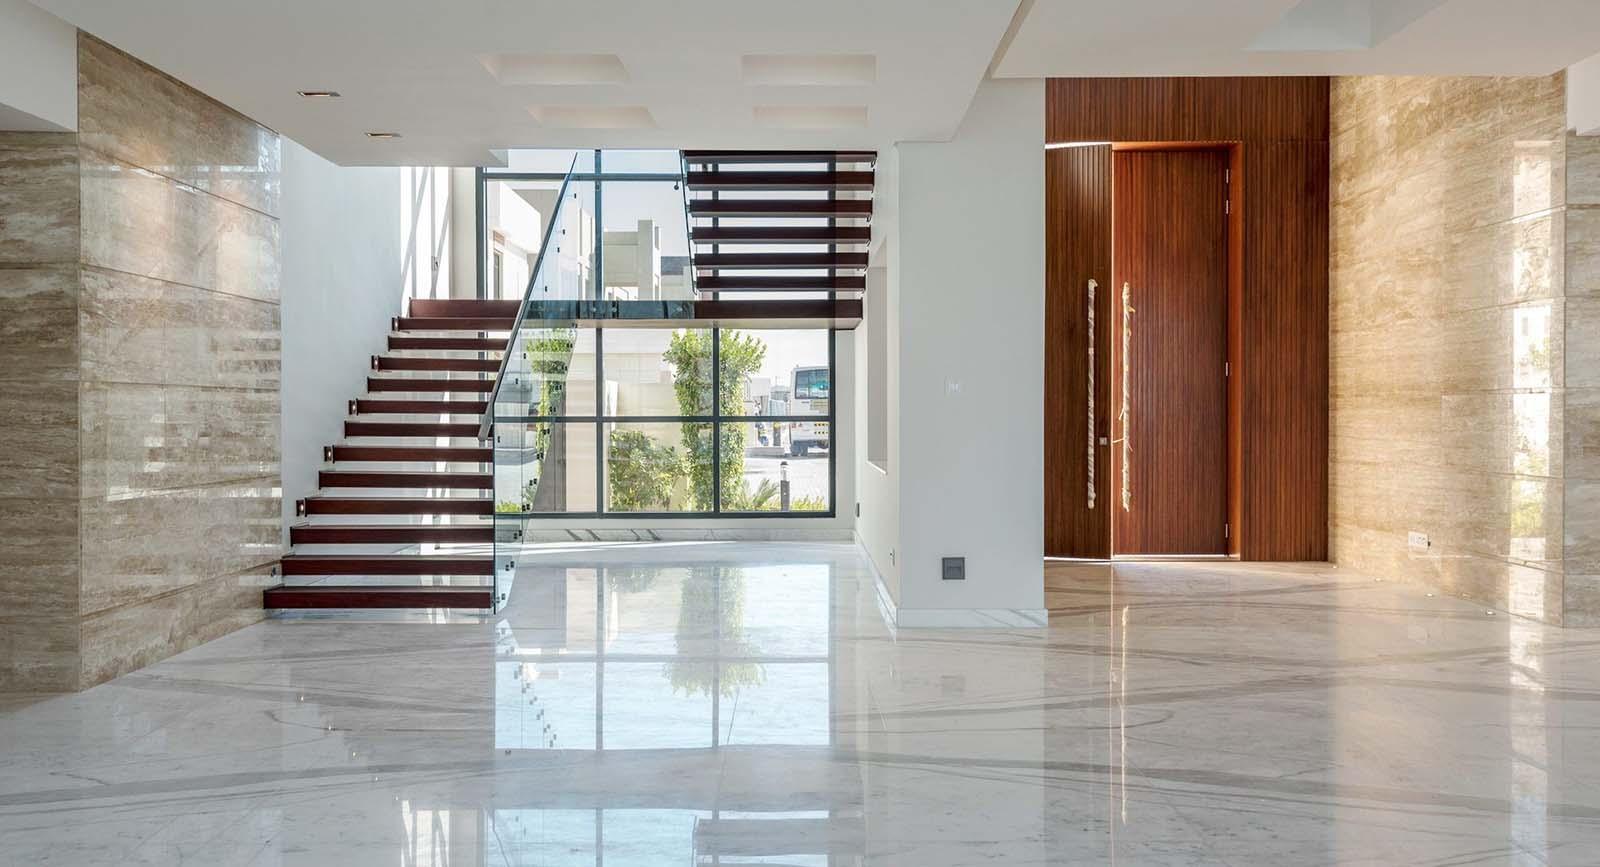 ultra modern staircase design open wood risers glass railings steel frame